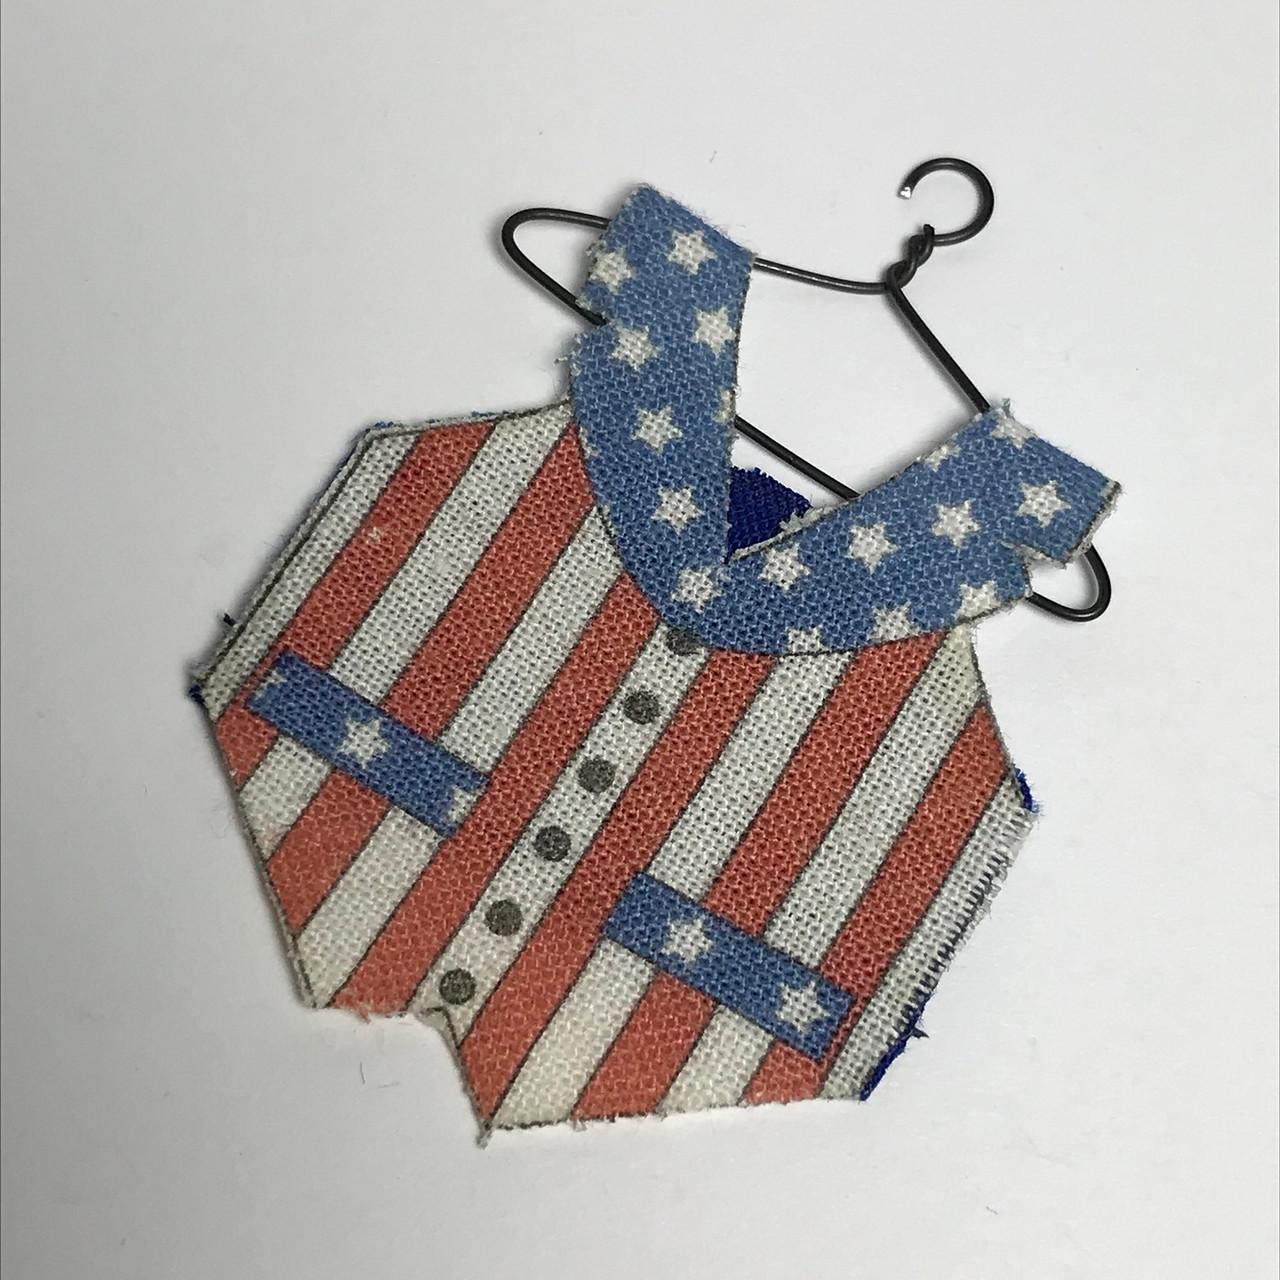 Patriotic Vest (JJR08-1002)